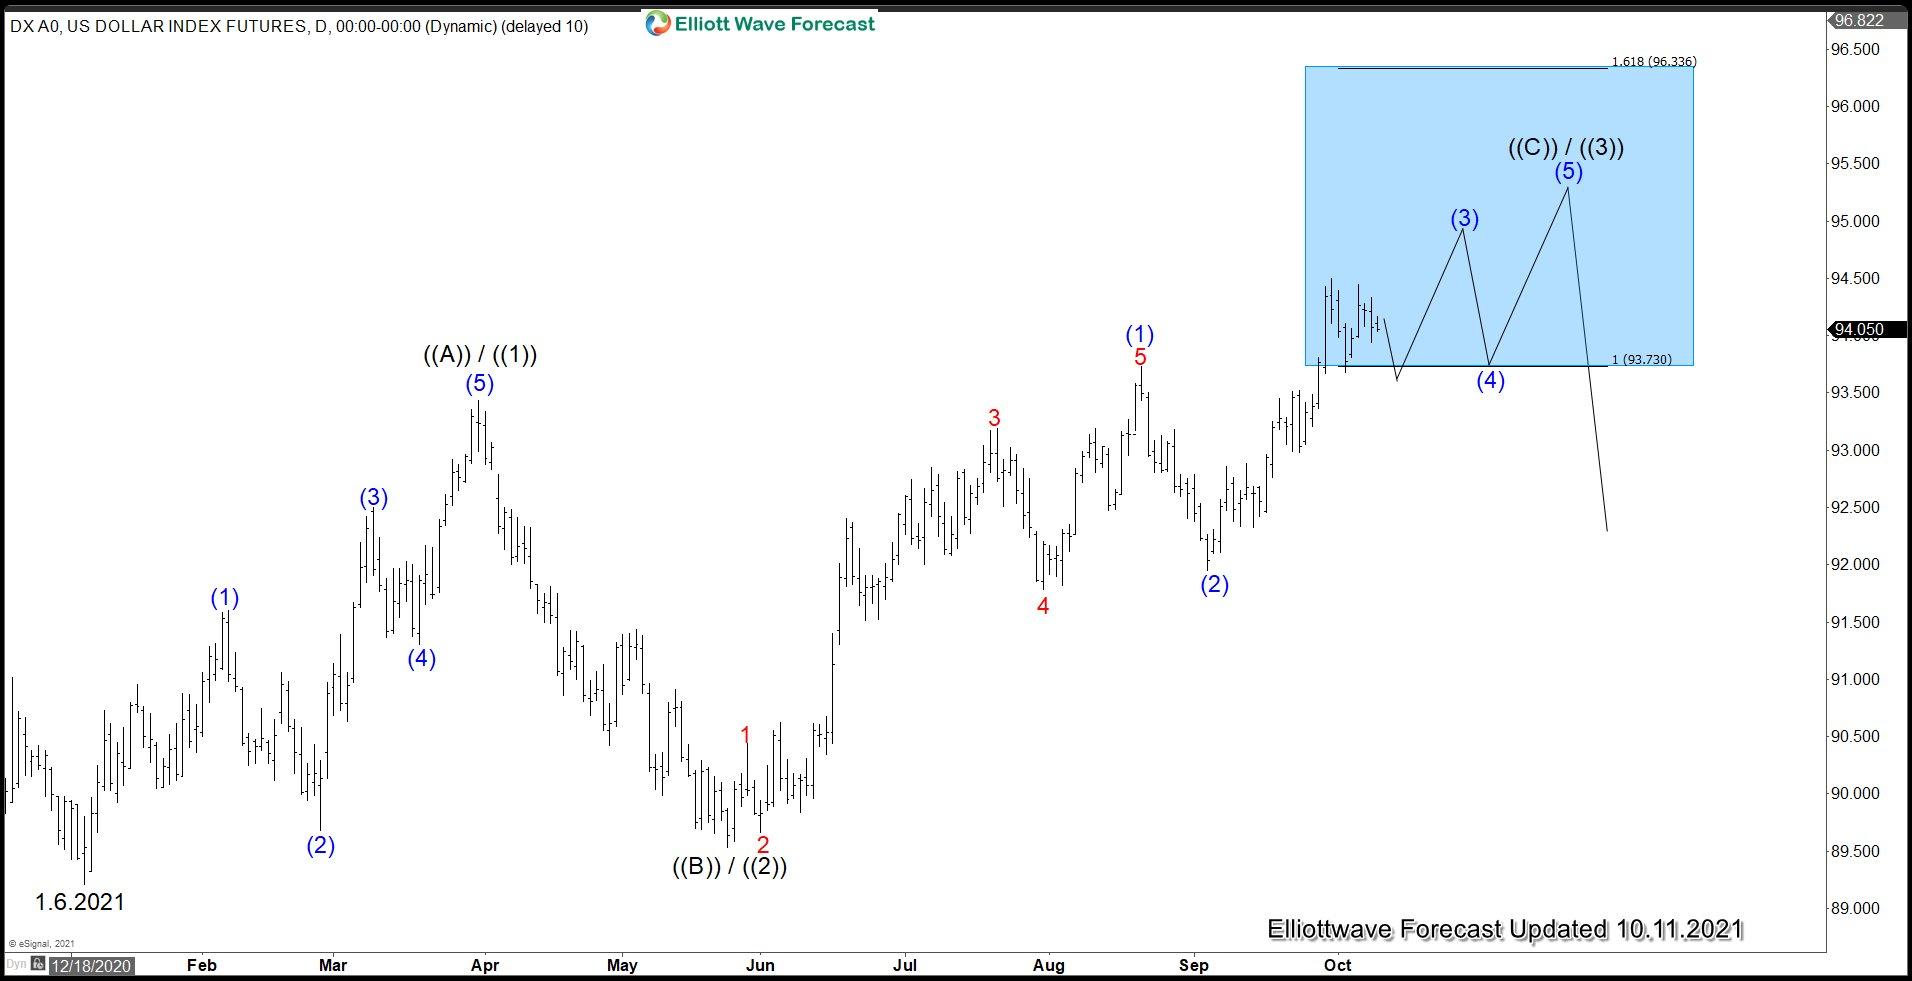 Dollar Index (DXY) Elliott Wave chart